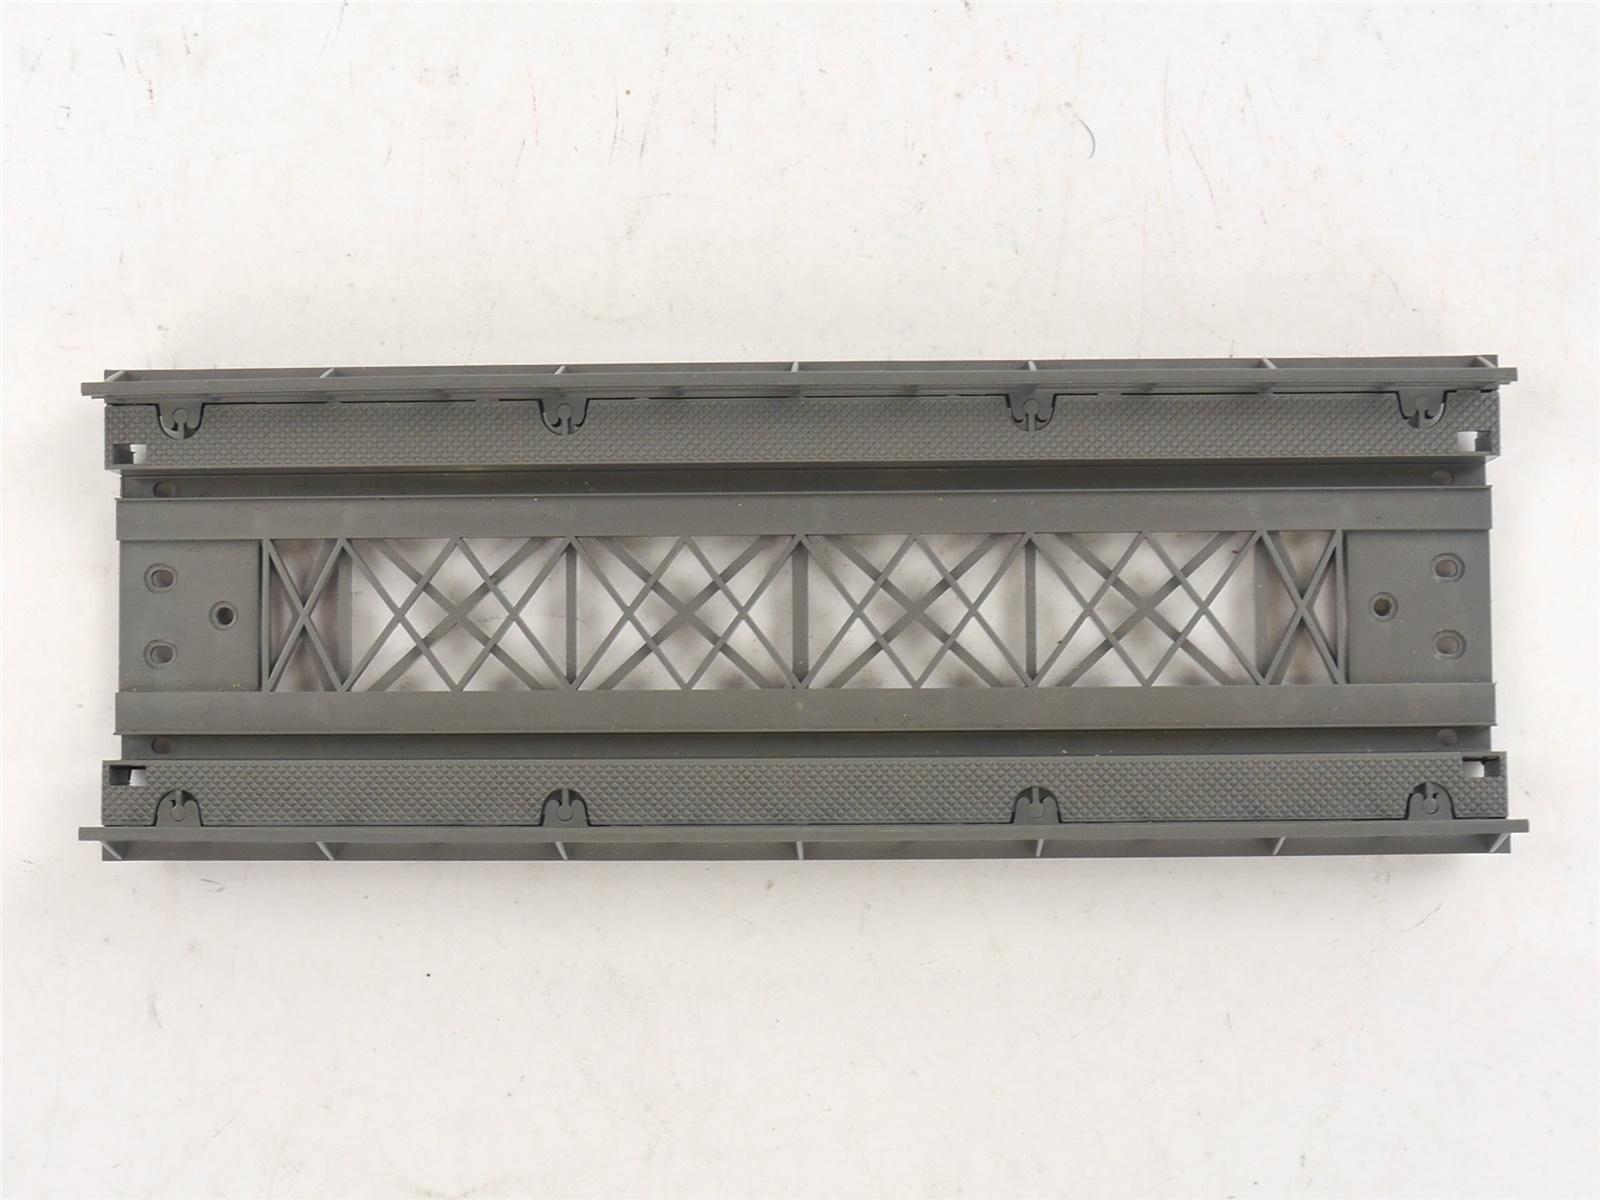 E238 Märklin H0 7268 Brücke Rampenstück gerade für K+M-Gleis / 180 mm *TOP*